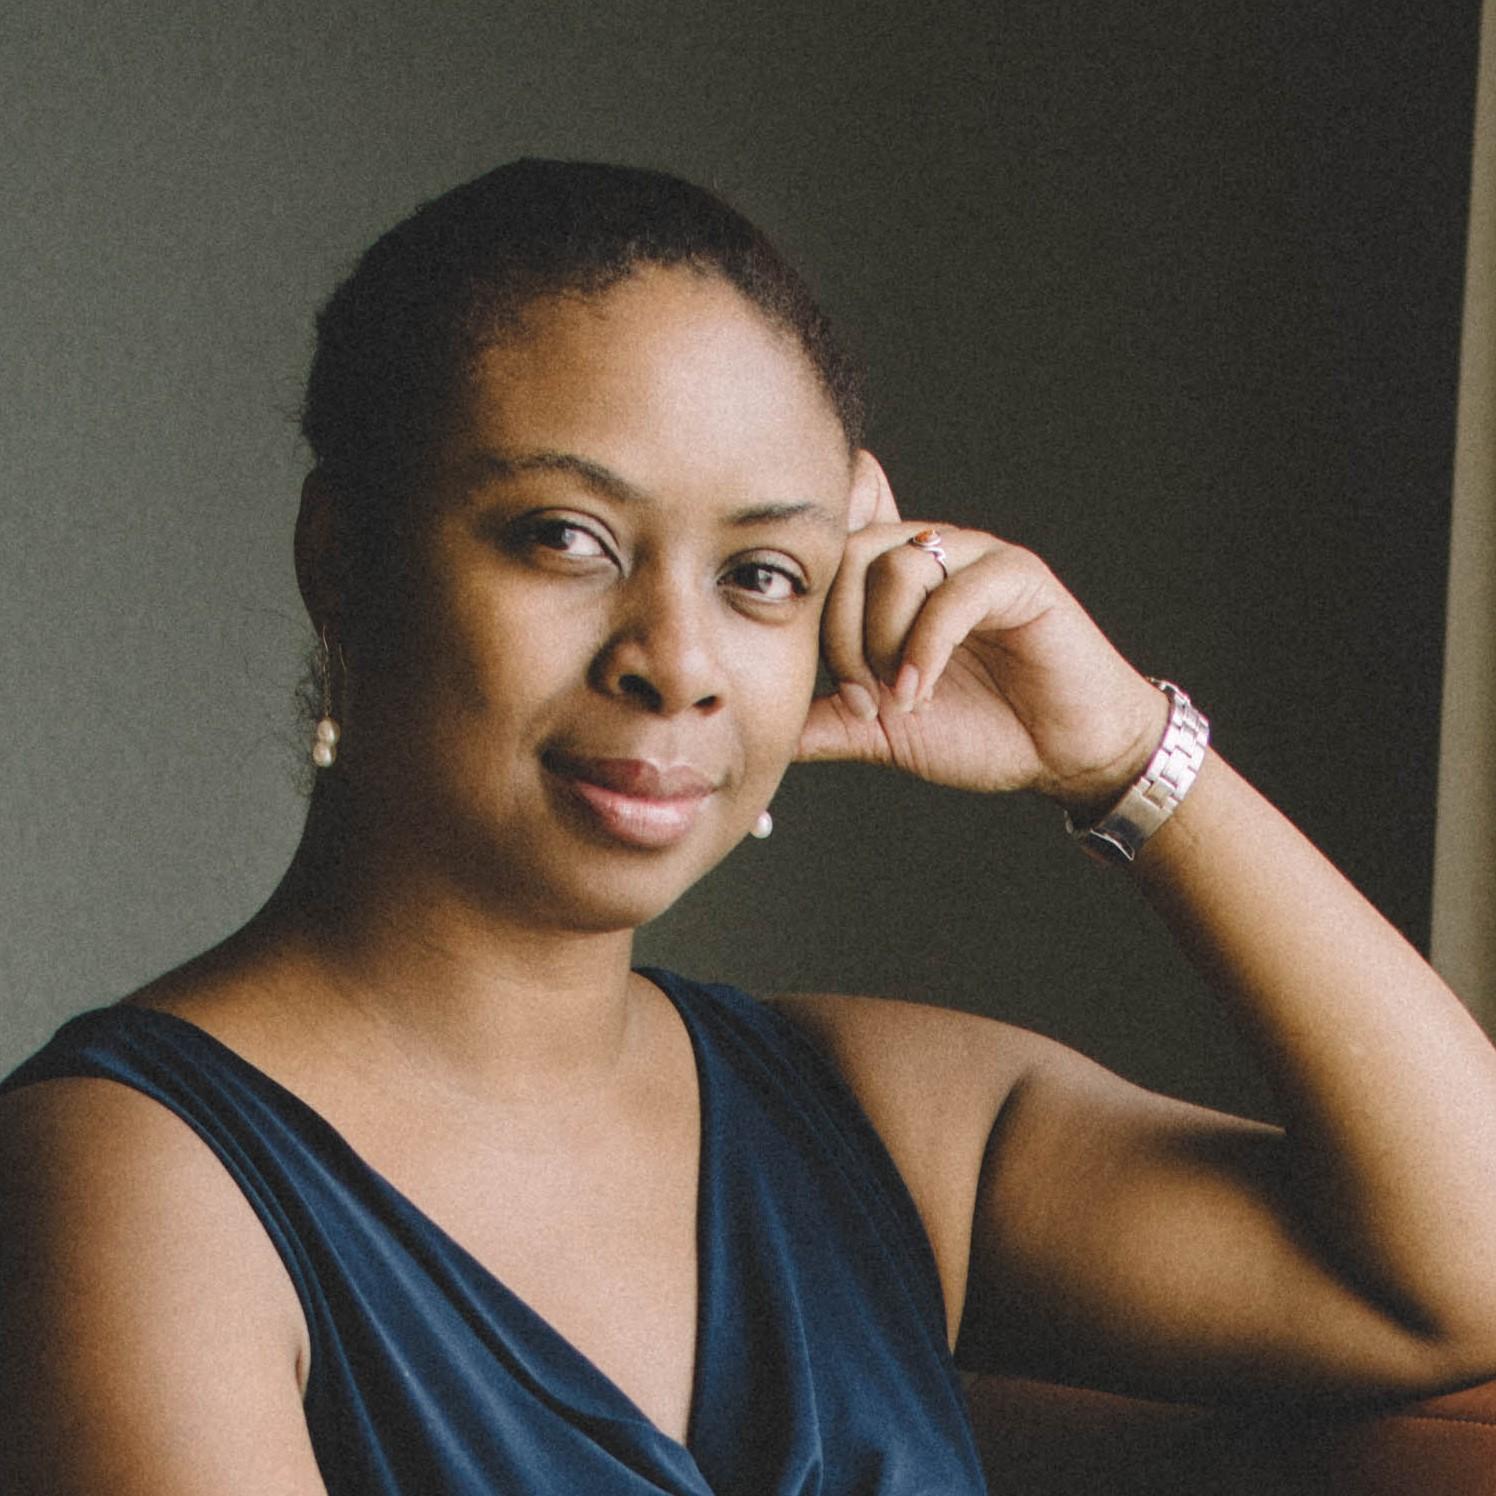 Janice Chaka, HR Expert + Founder @ The Career Introvert